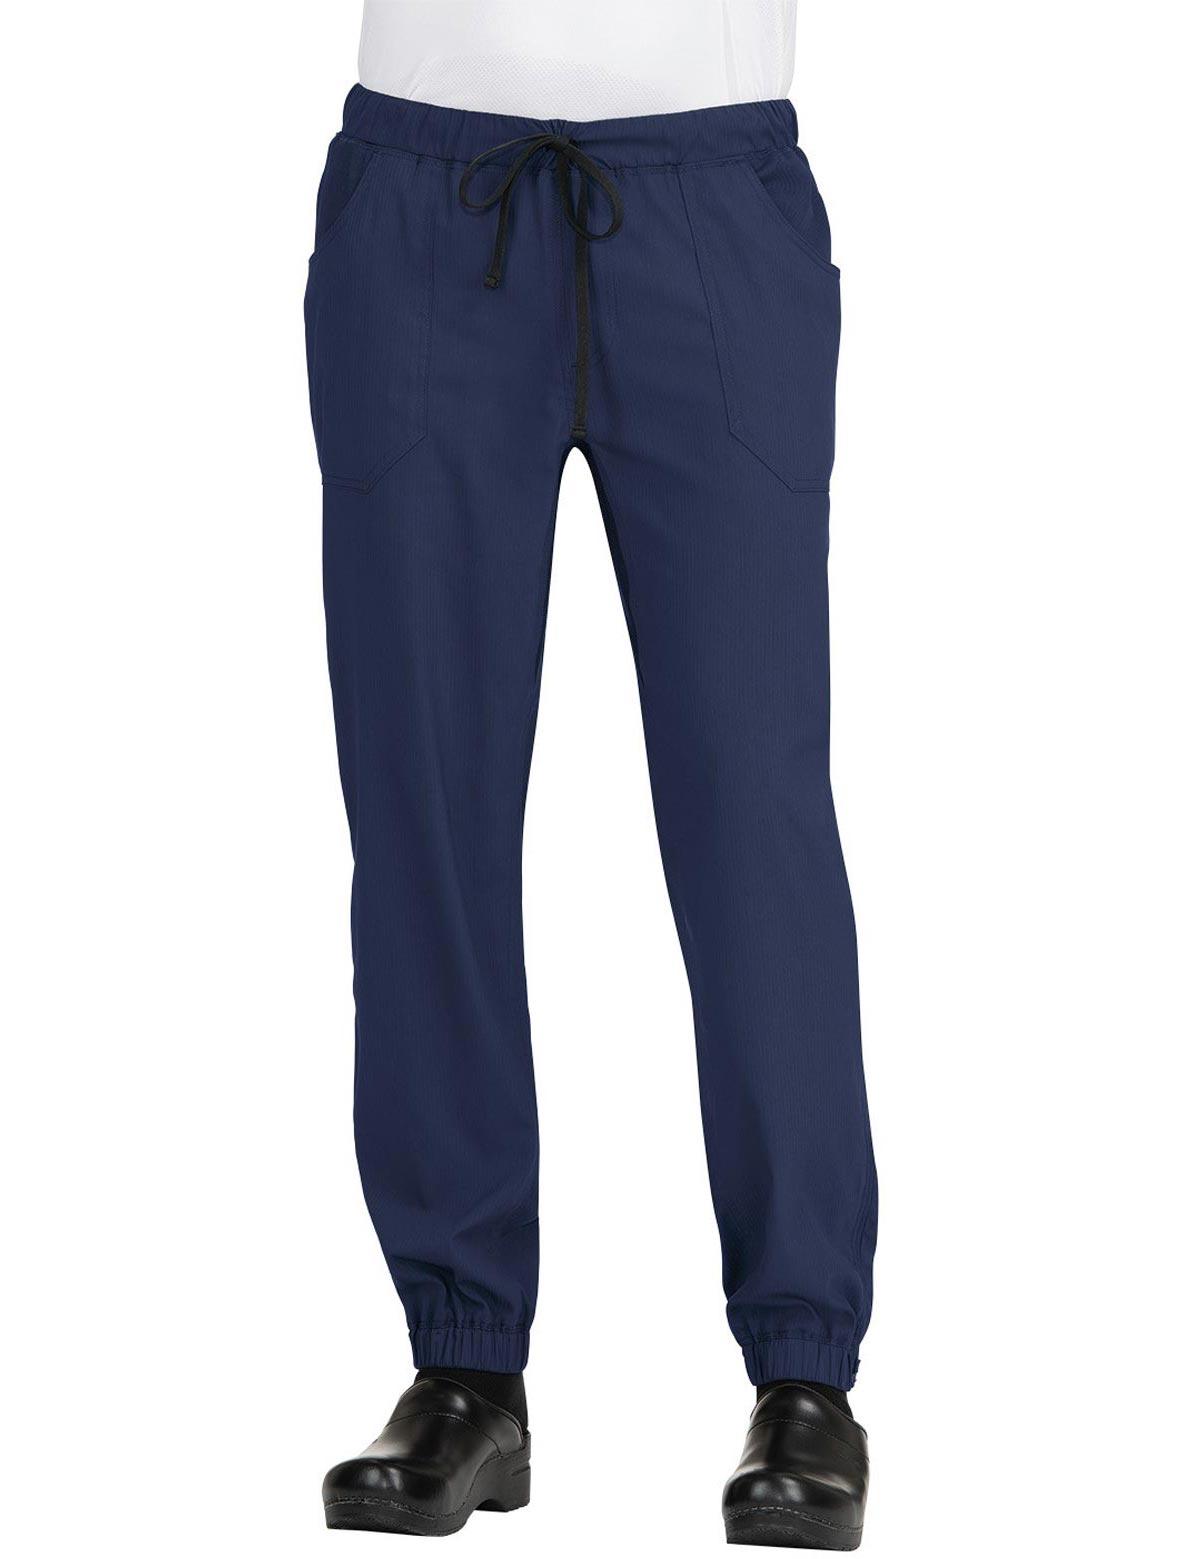 'Jaxon' Pants